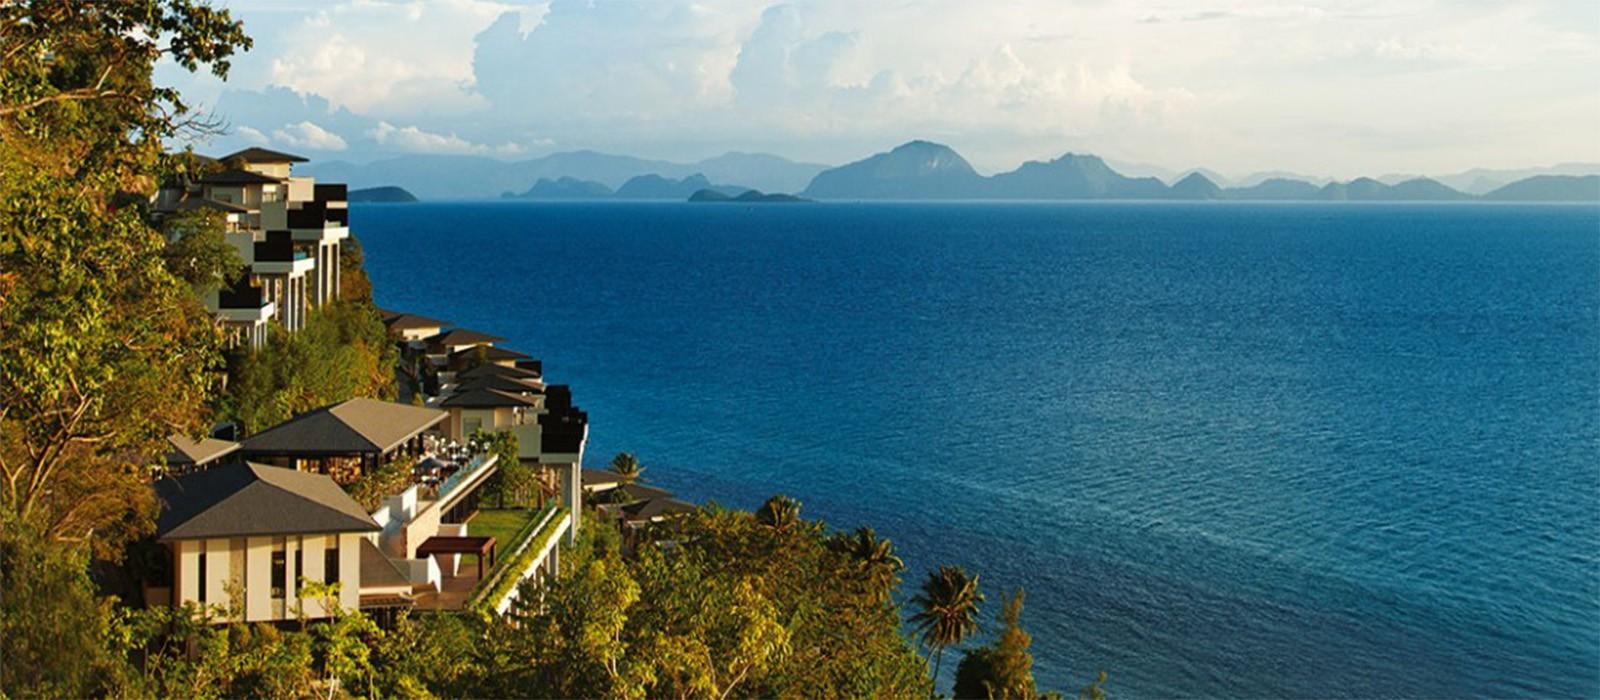 Conrad Koh Samui - Luxury Thailand Holiday packages - header